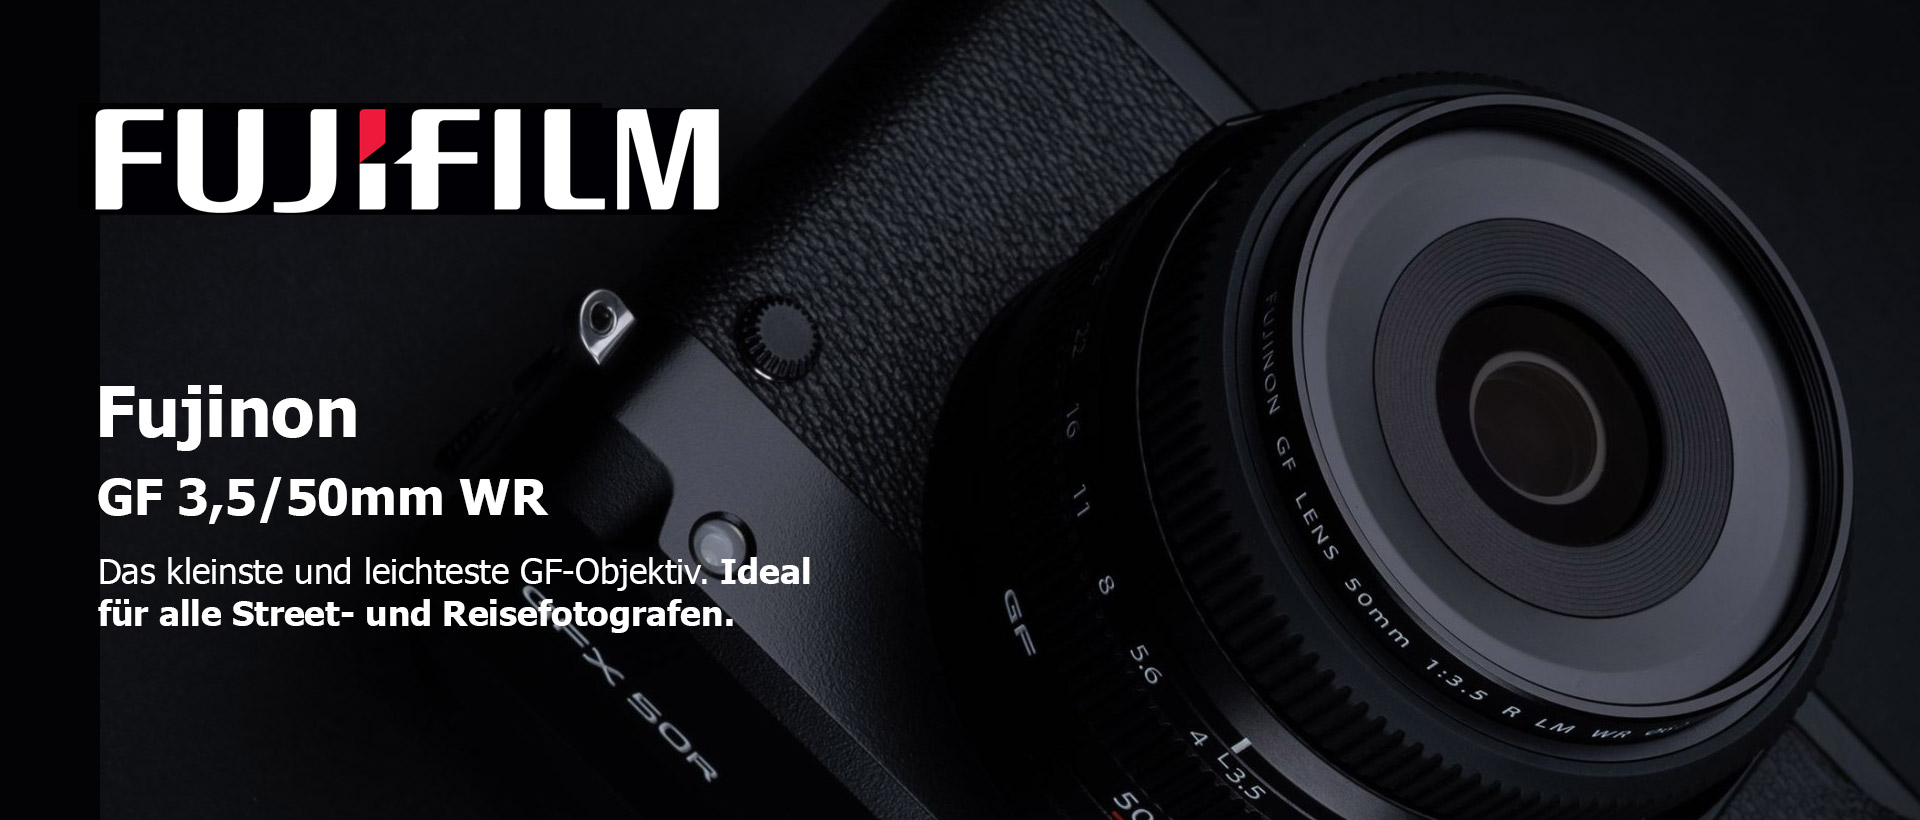 Fujinon GF 3,5/50mm WR